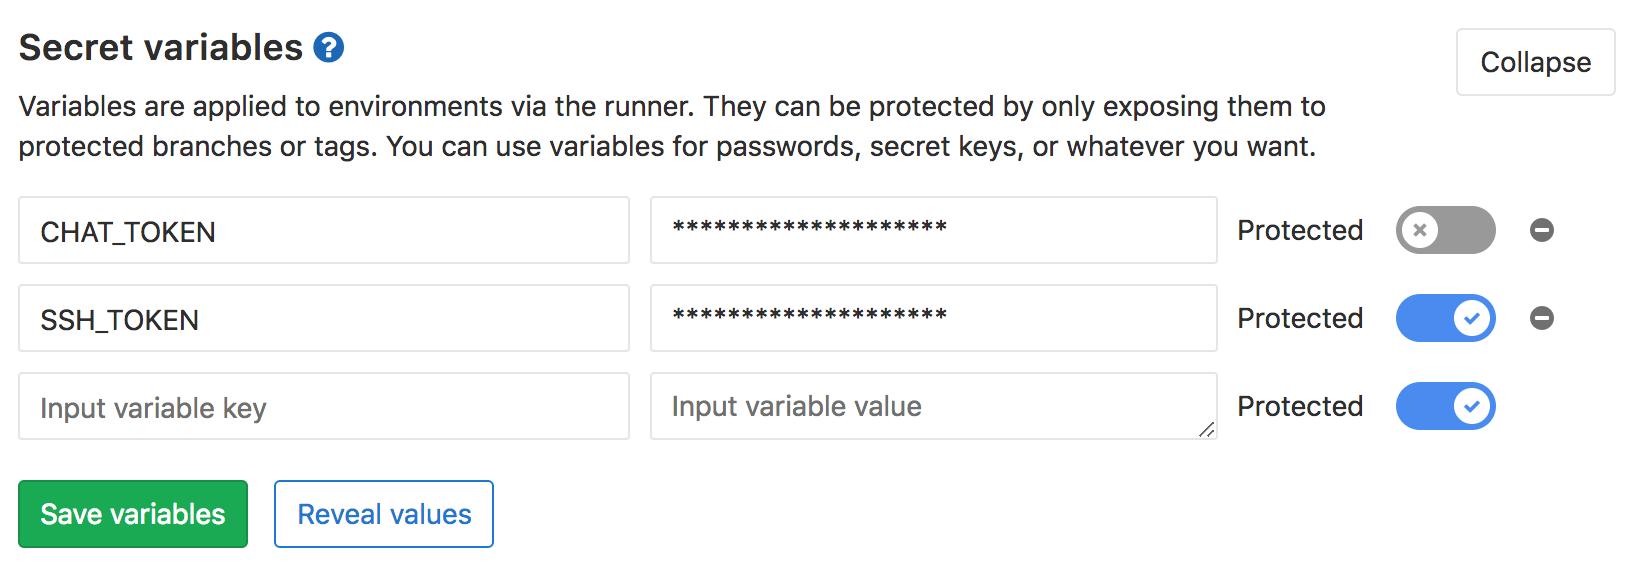 doc/ci/variables/img/secret_variables.png